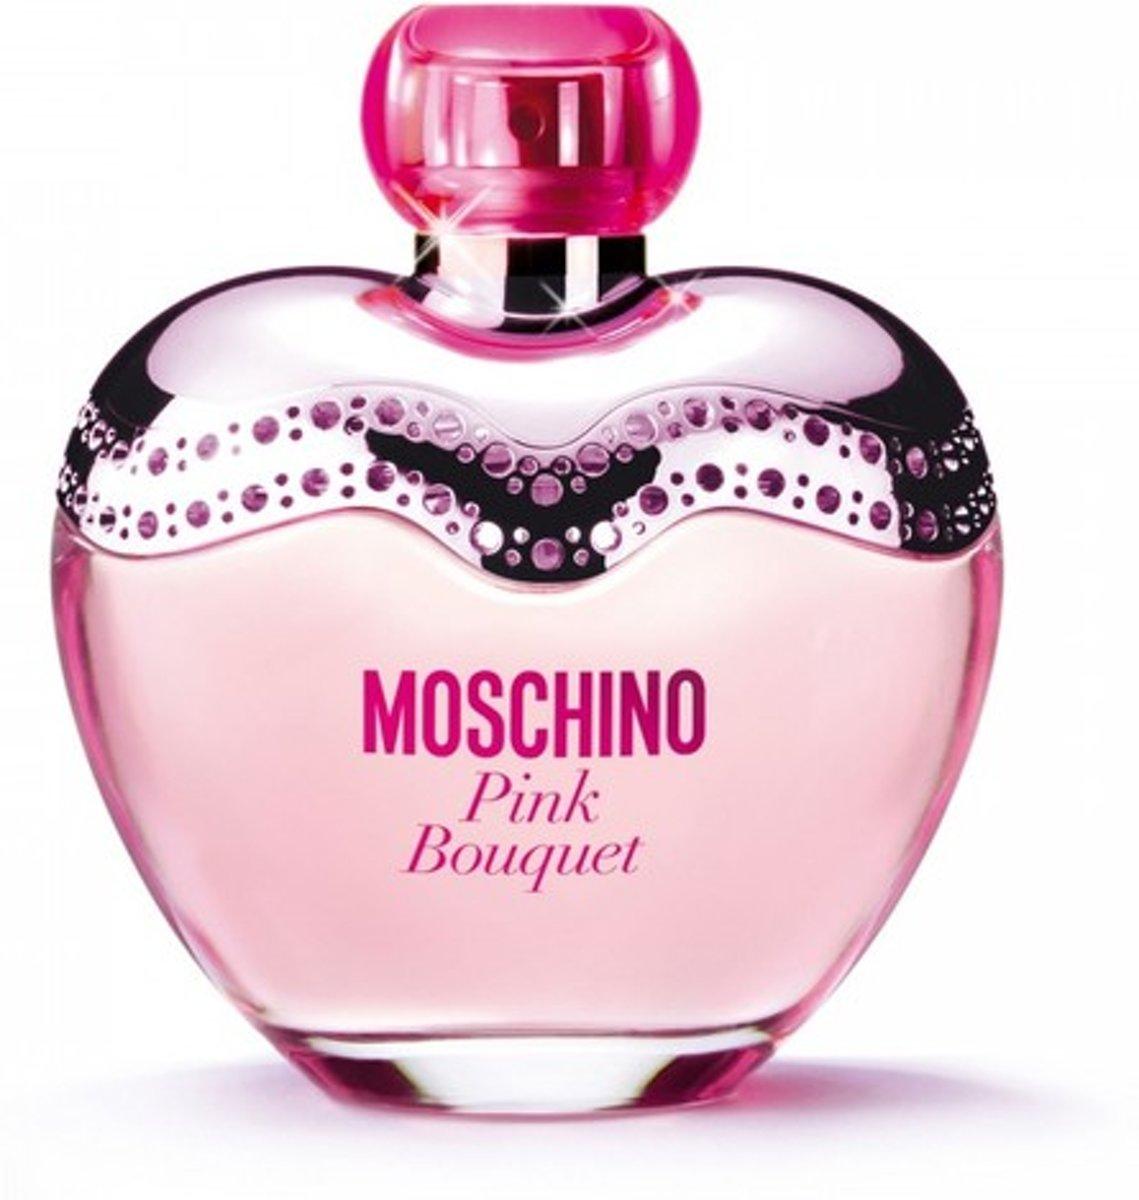 MULTI BUNDEL 2 stuks Moschino Pink Bouquet Eau De Toilette Spray 100ml kopen